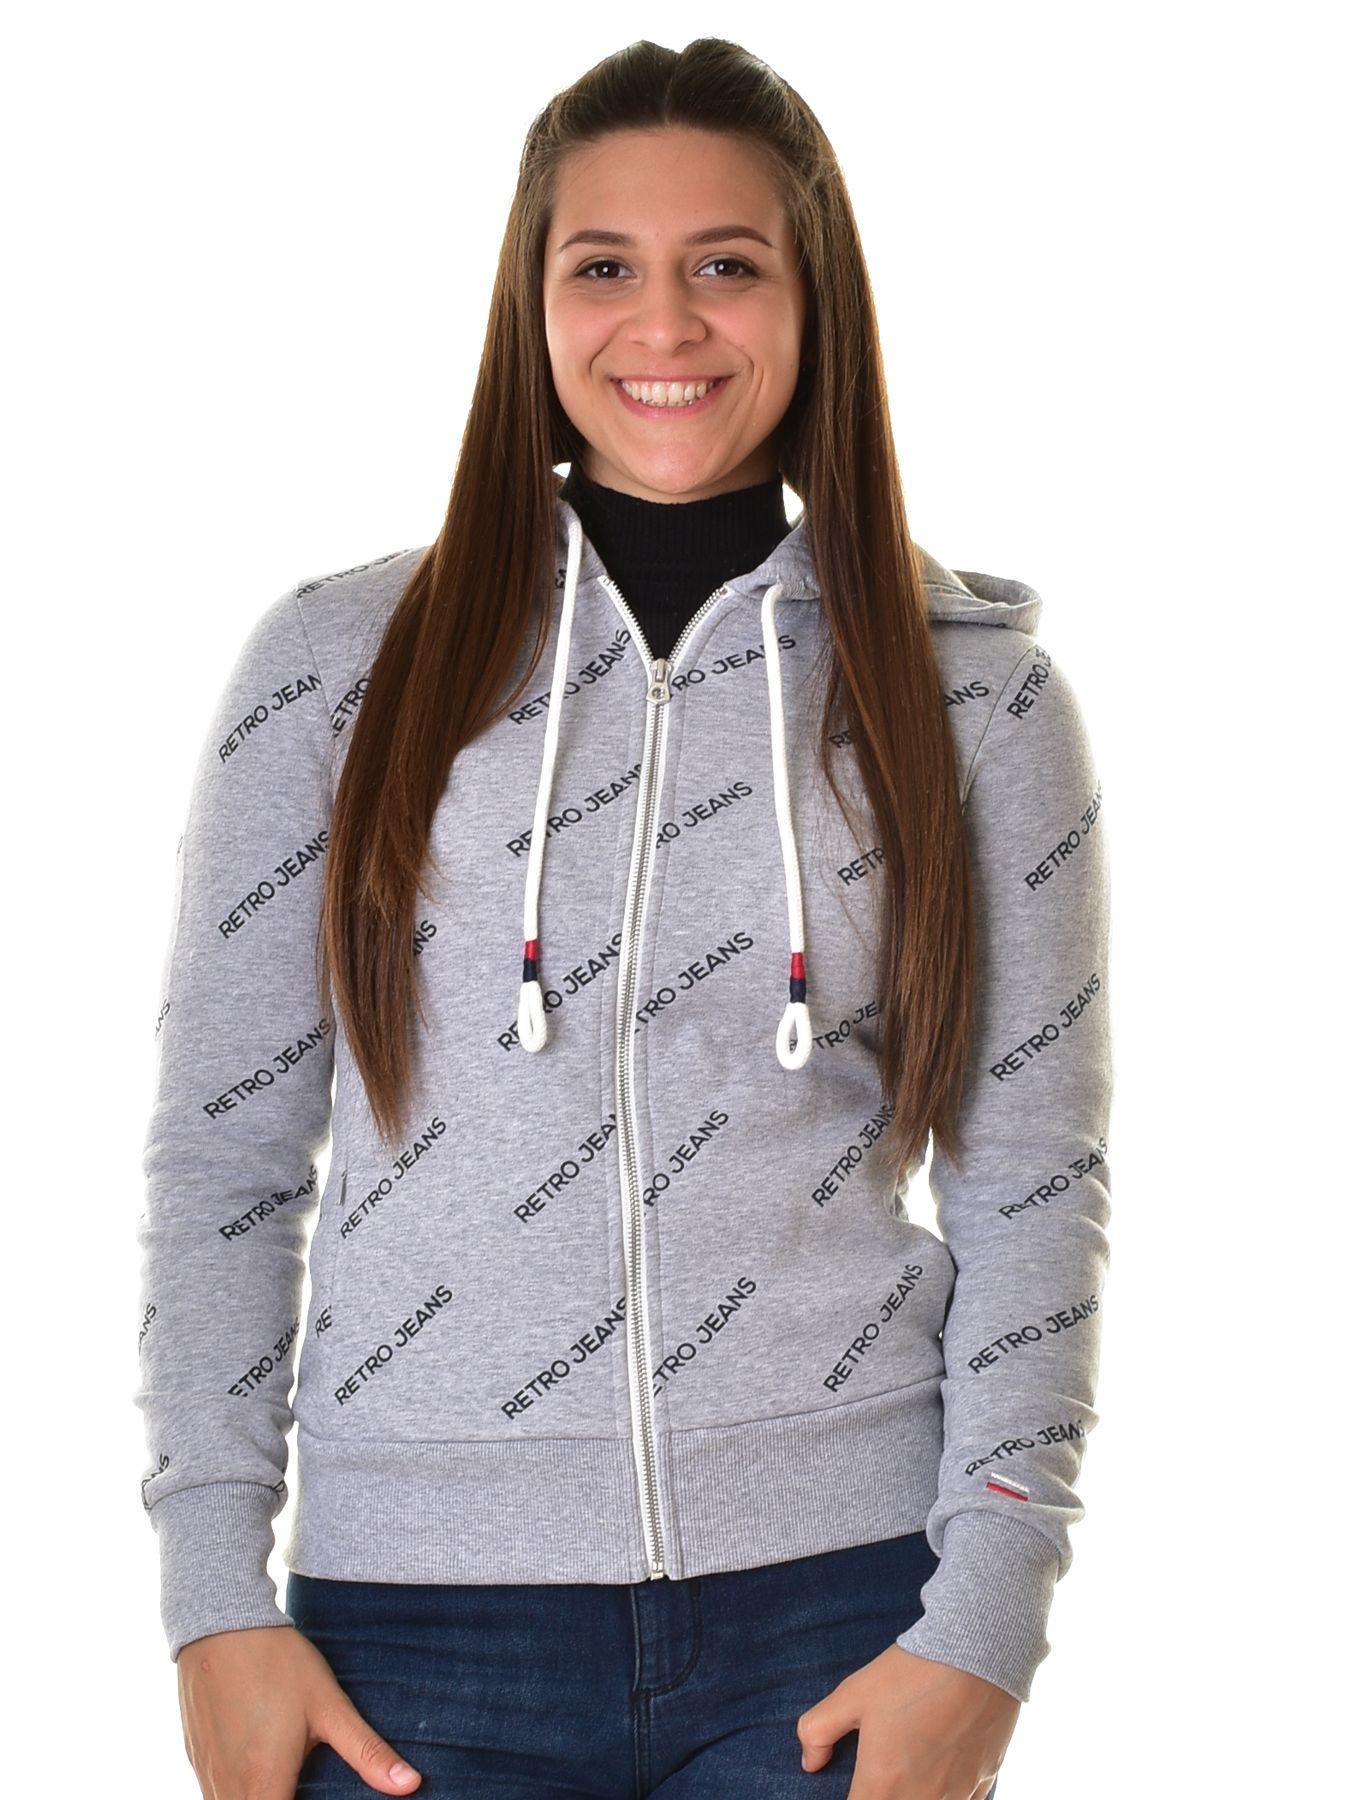 Retro Jeans női zippes kapucnis pulóver ENRICA | Markasbolt